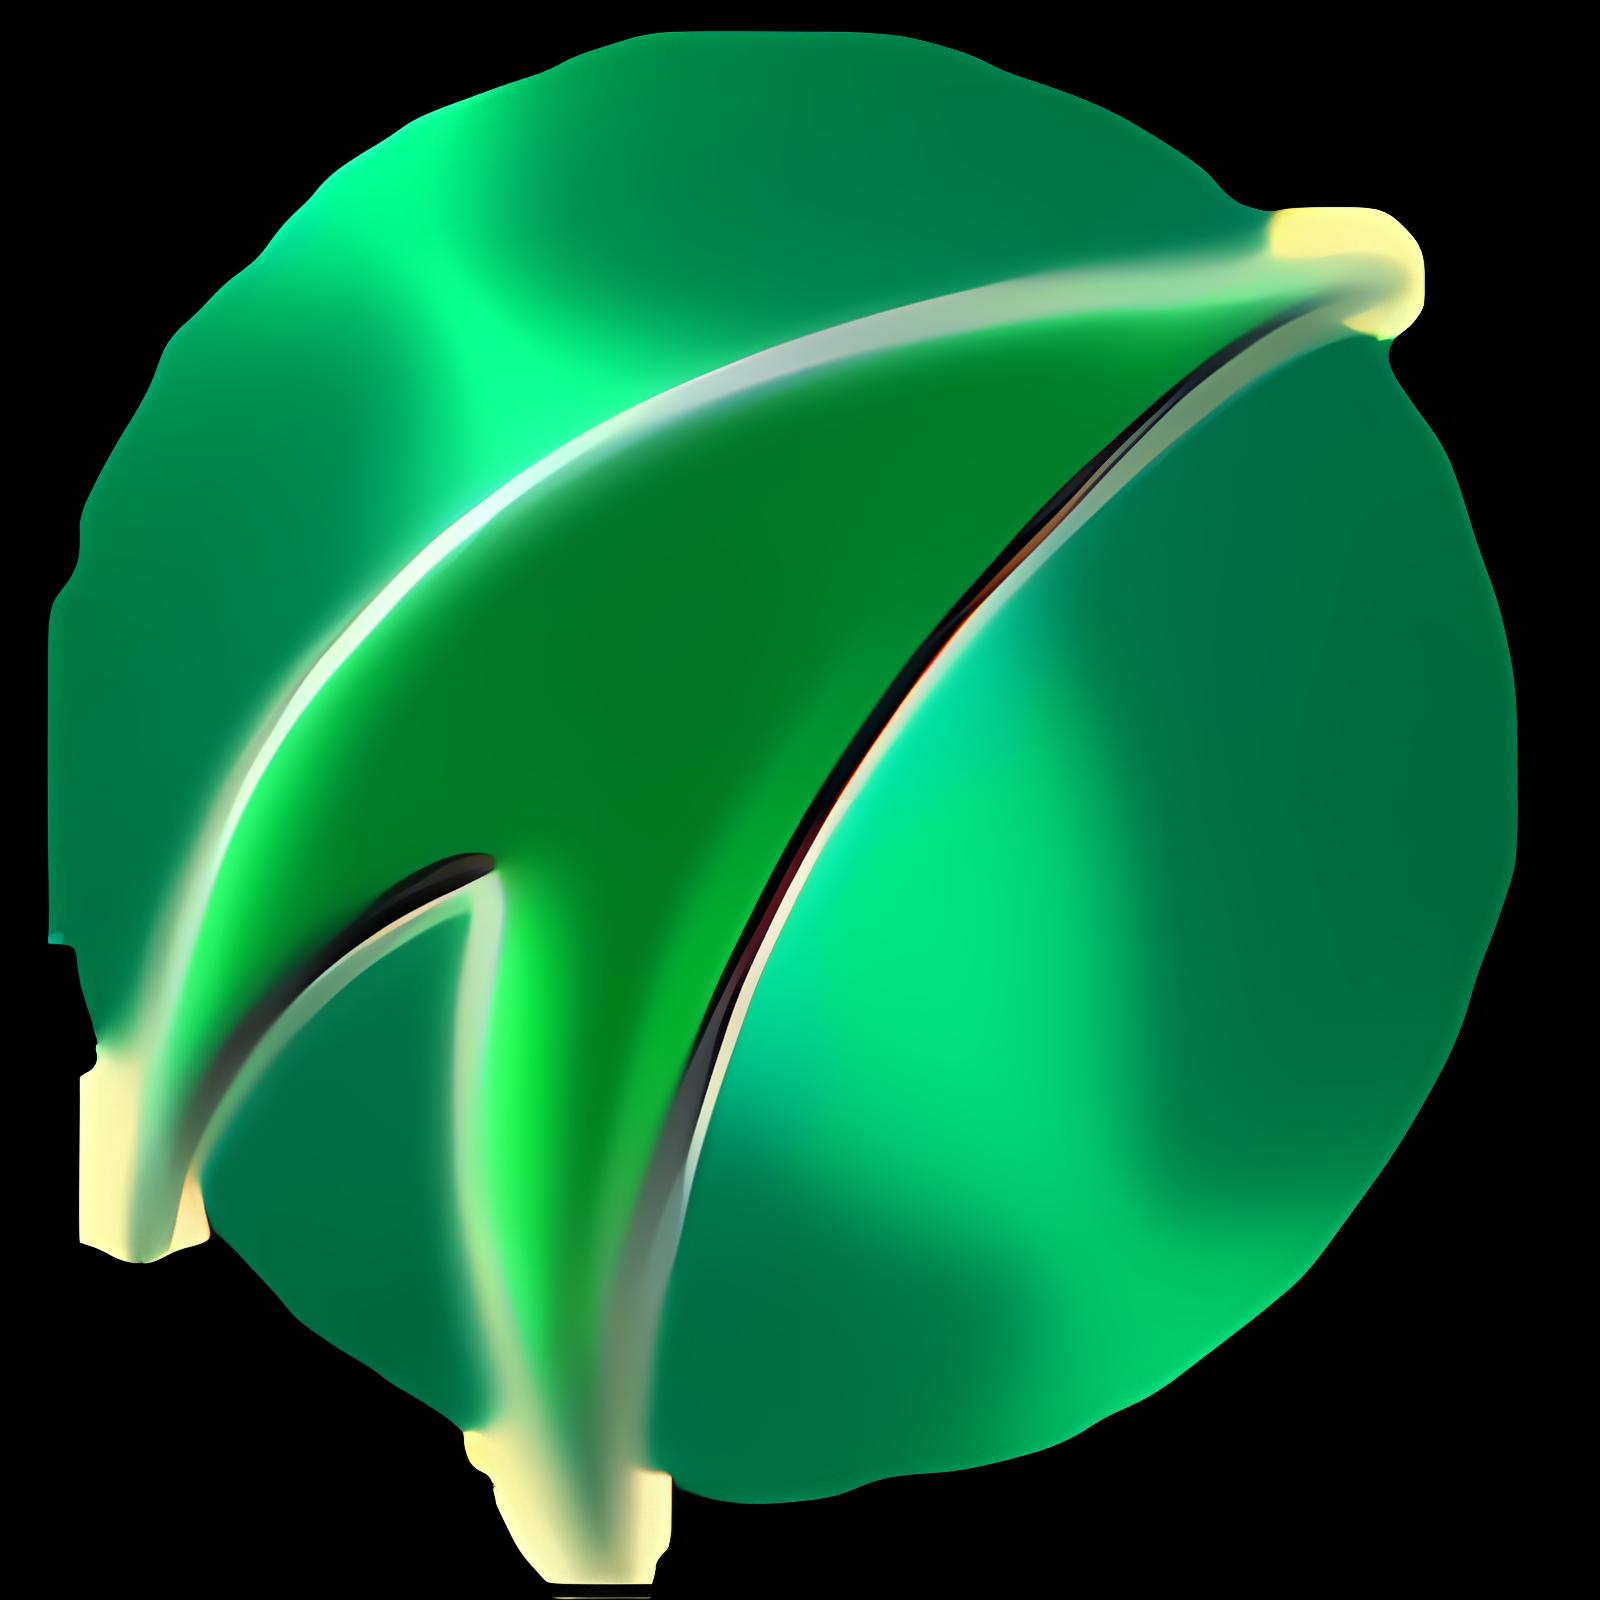 W32/Scar Free Virus Removal Tool